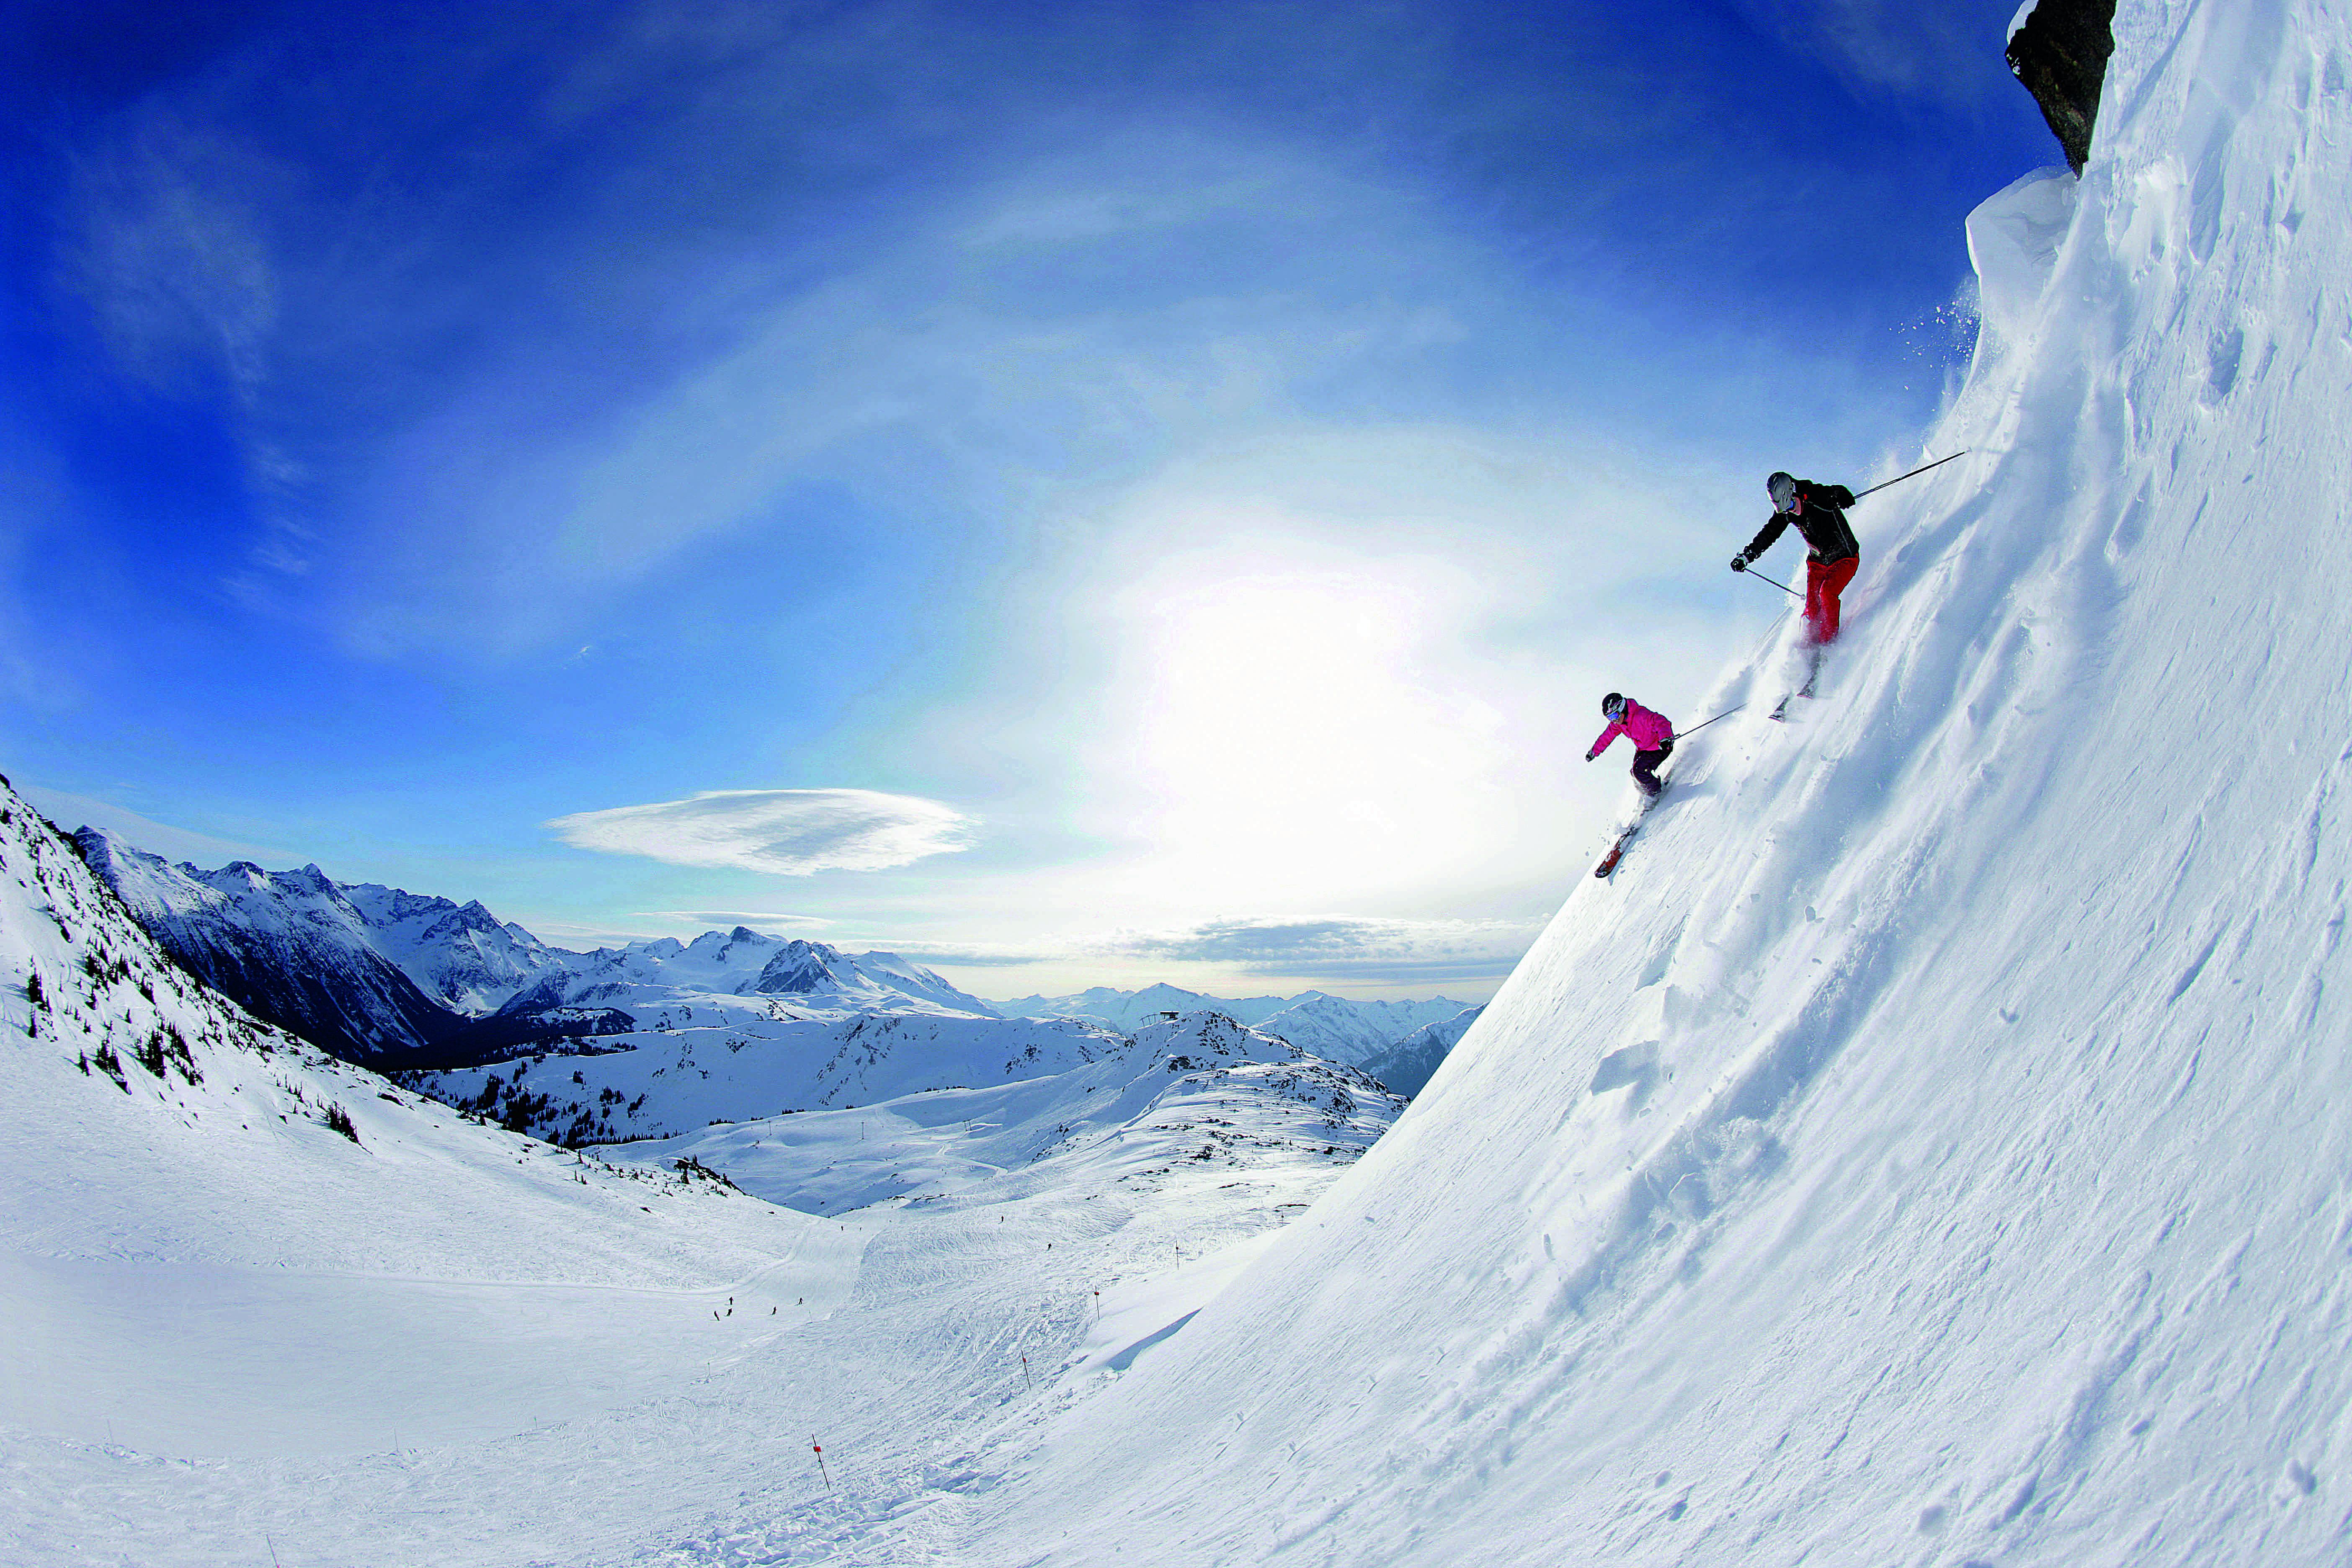 Downhill skiing, Symphony Bowl, Whistler, British Columbia, Canada